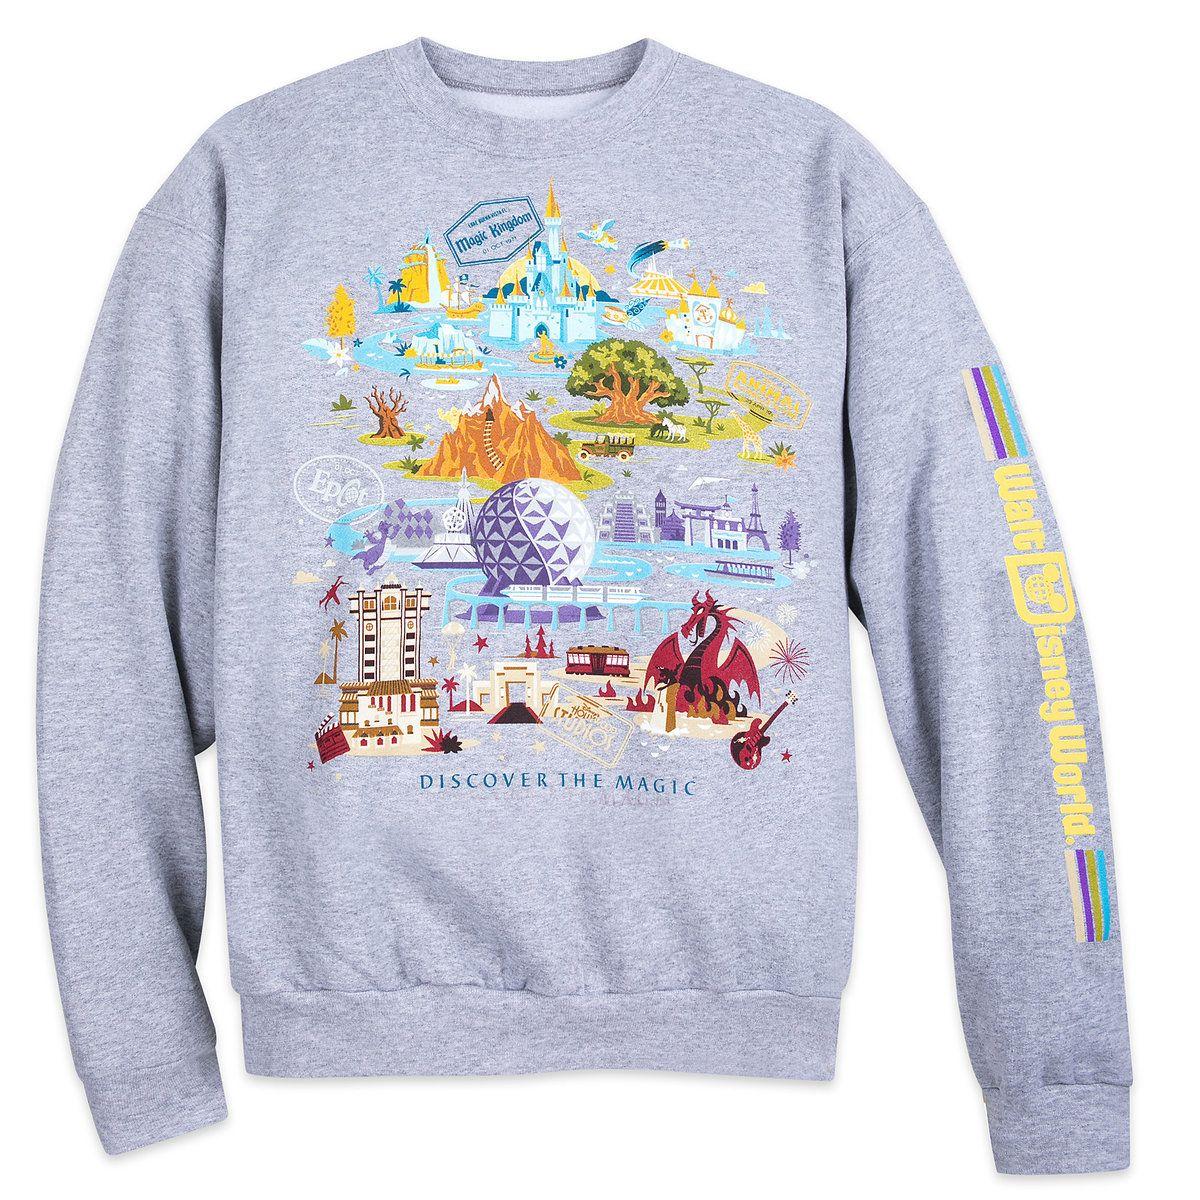 Walt Disney World Pullover Sweatshirt for Adults in 2019